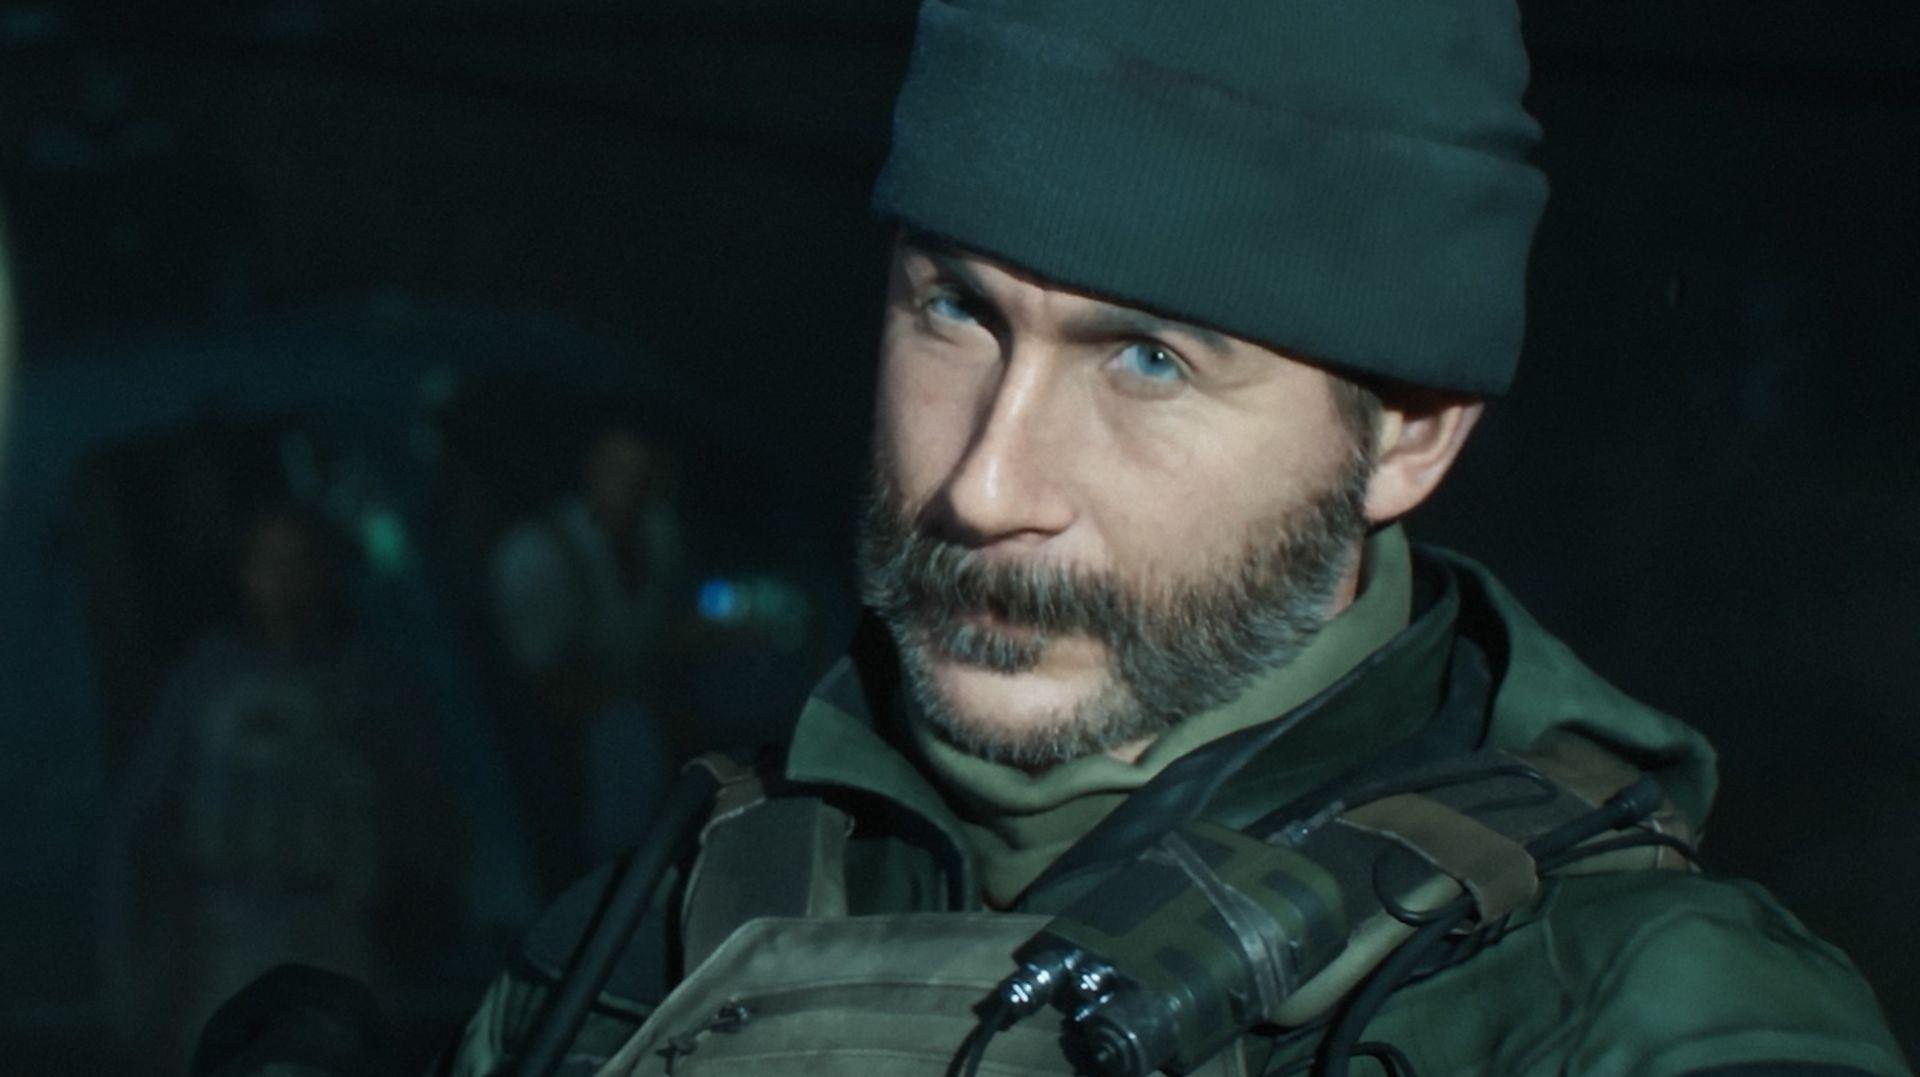 Call of Duty Modern Warfare Captain Price